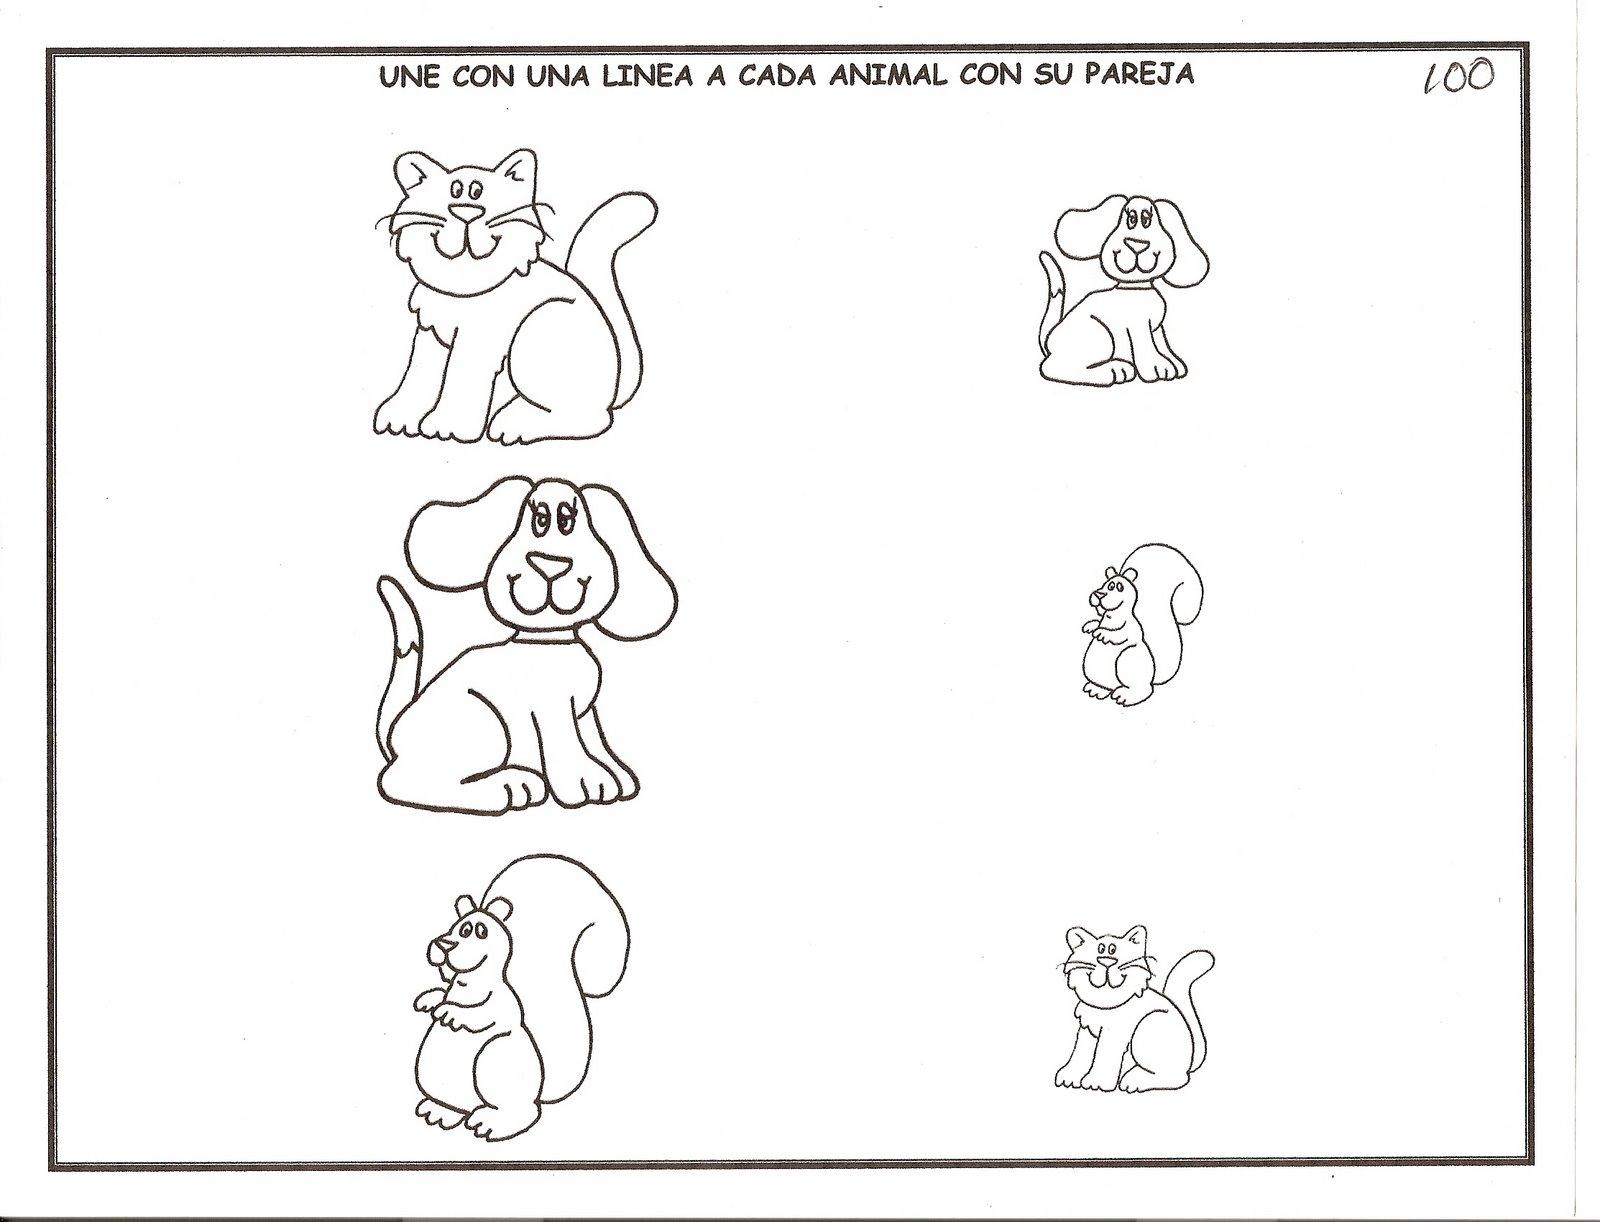 Juegos De Pintar Dinosaurios Que Vuelan Biblioteca De: Fichas Conceptos Infantil